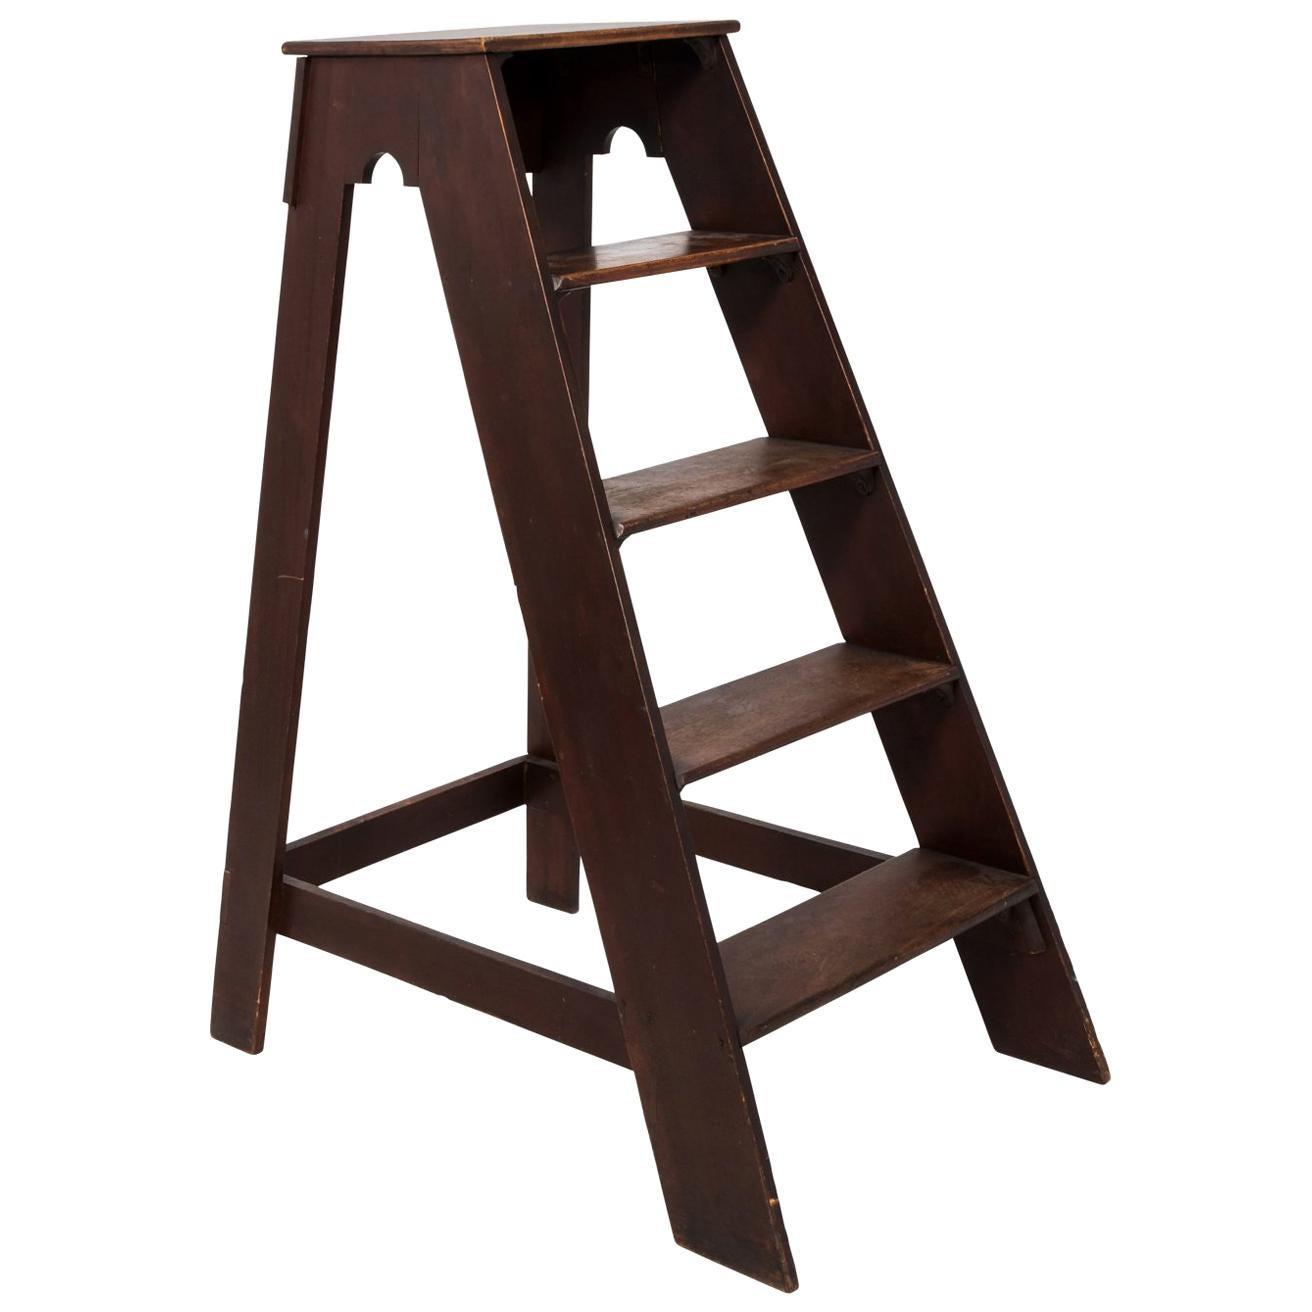 Early 20th Century Mahogany Ladder Steps